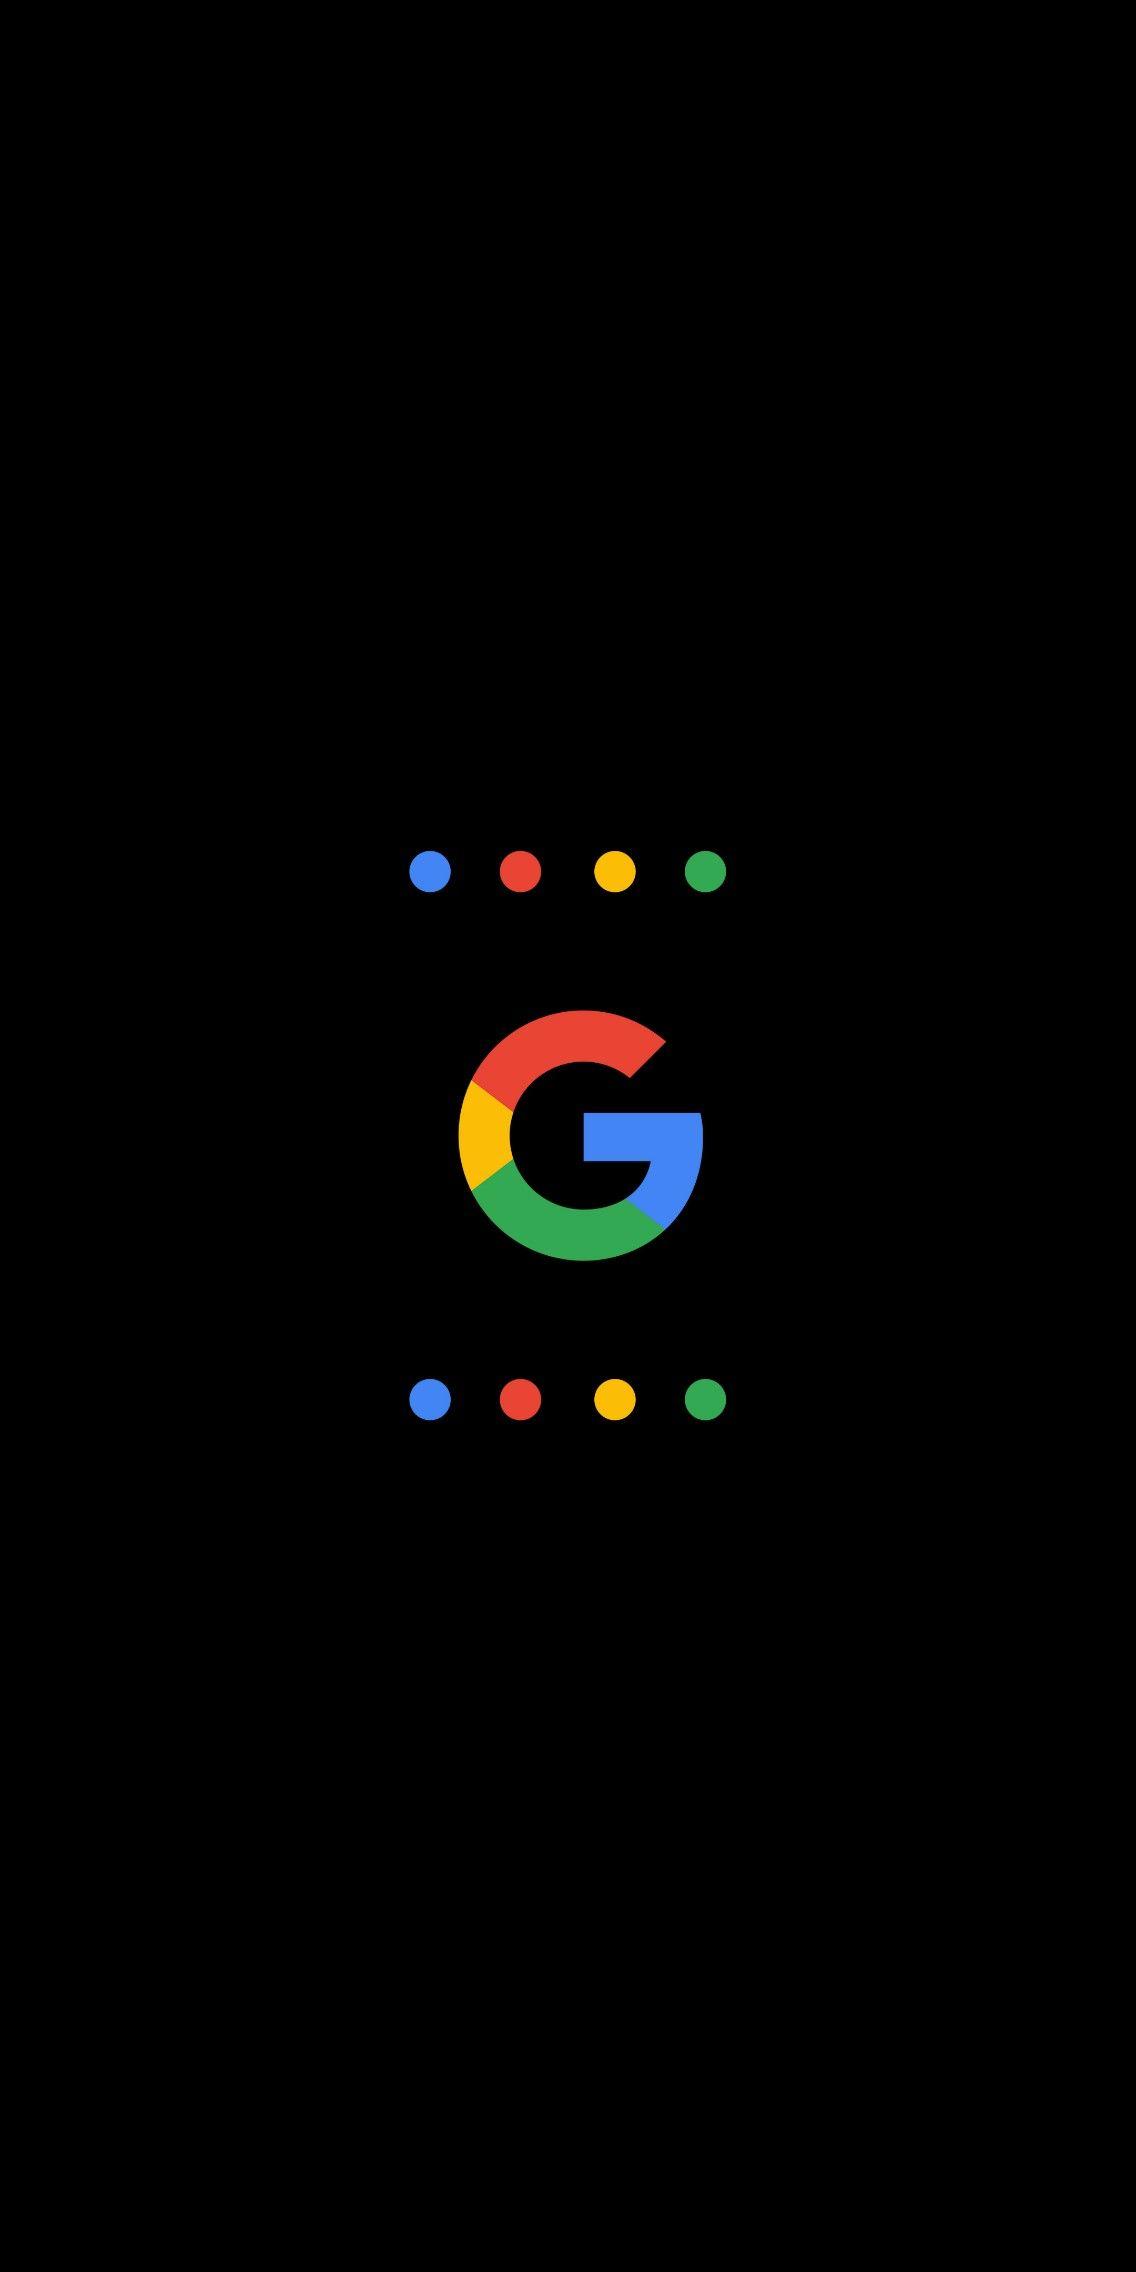 Pin By Iyan Sofyan On Material Minimal Pattern 2 Logo Wallpaper Hd Android Wallpaper Space Google Pixel Wallpaper